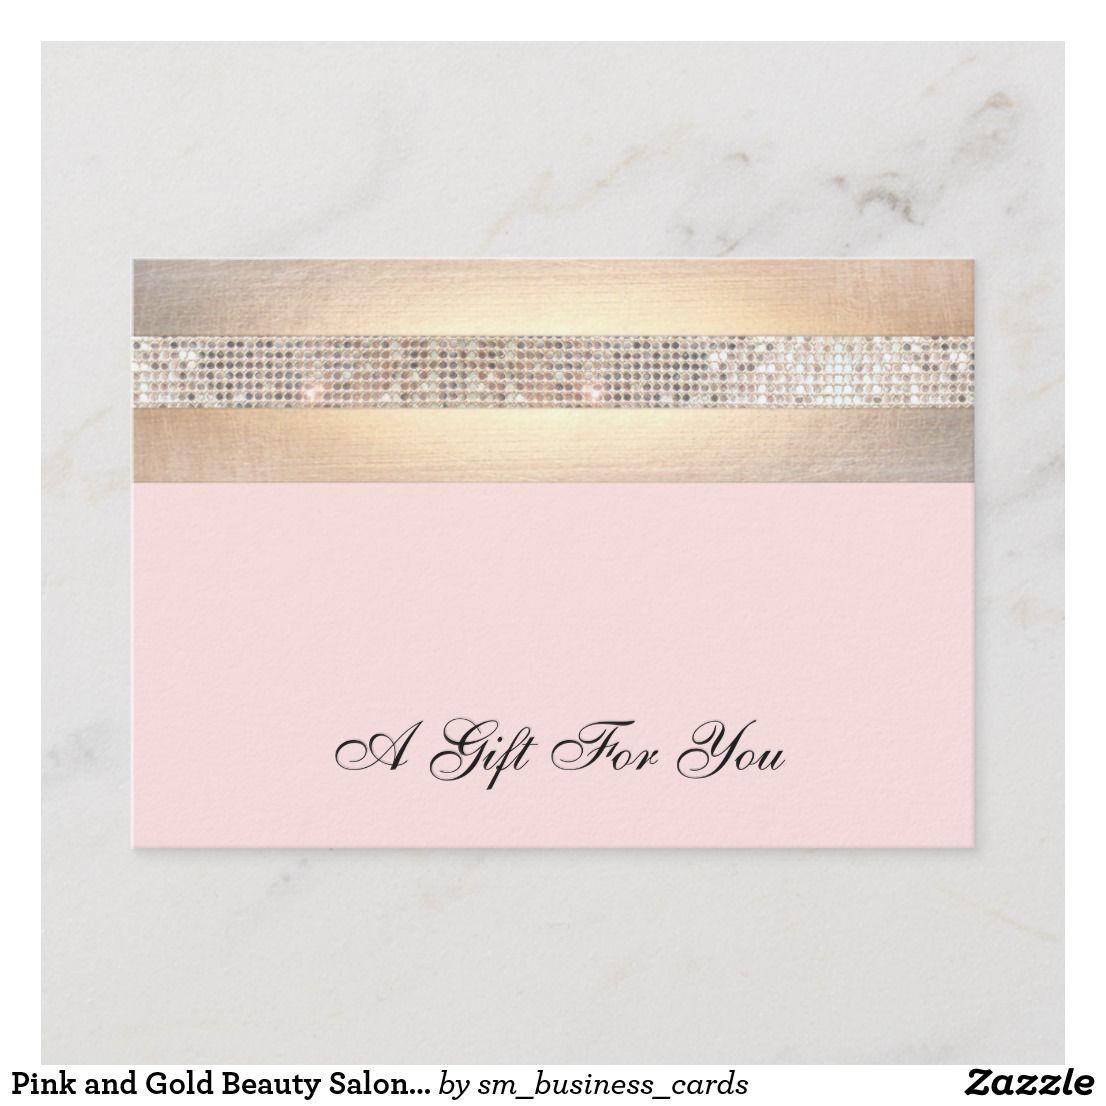 Pink and Gold Beauty Salon Gift Certificate  Zazzle.com  Salon